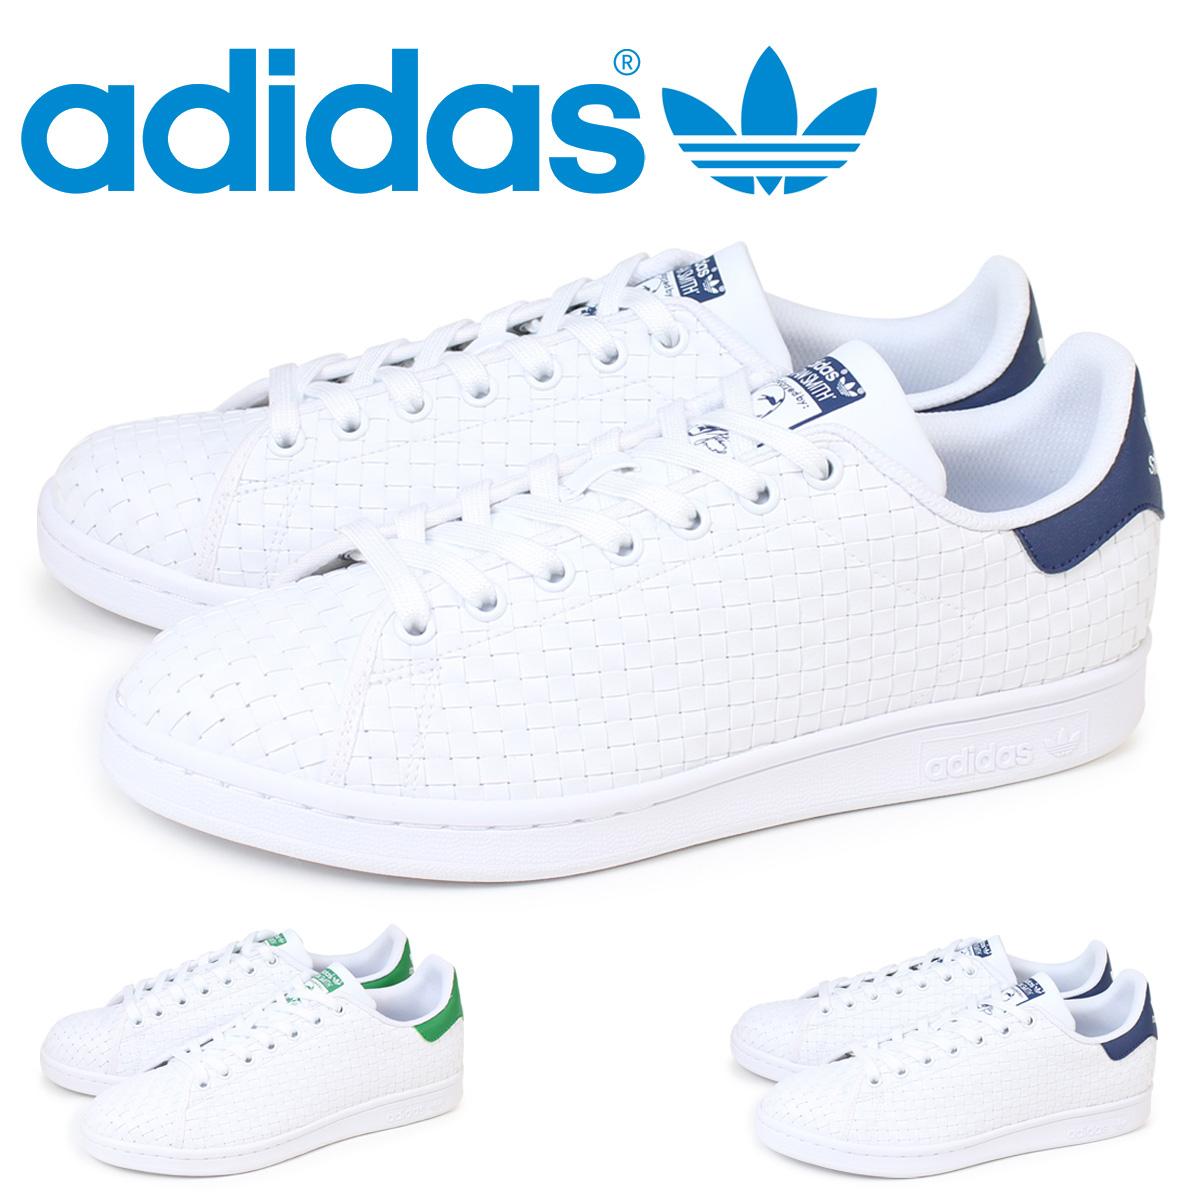 Adidas Stan Smith adidas Originals sneakers STAN SMITH men BB0051 BB1468 shoes white originals